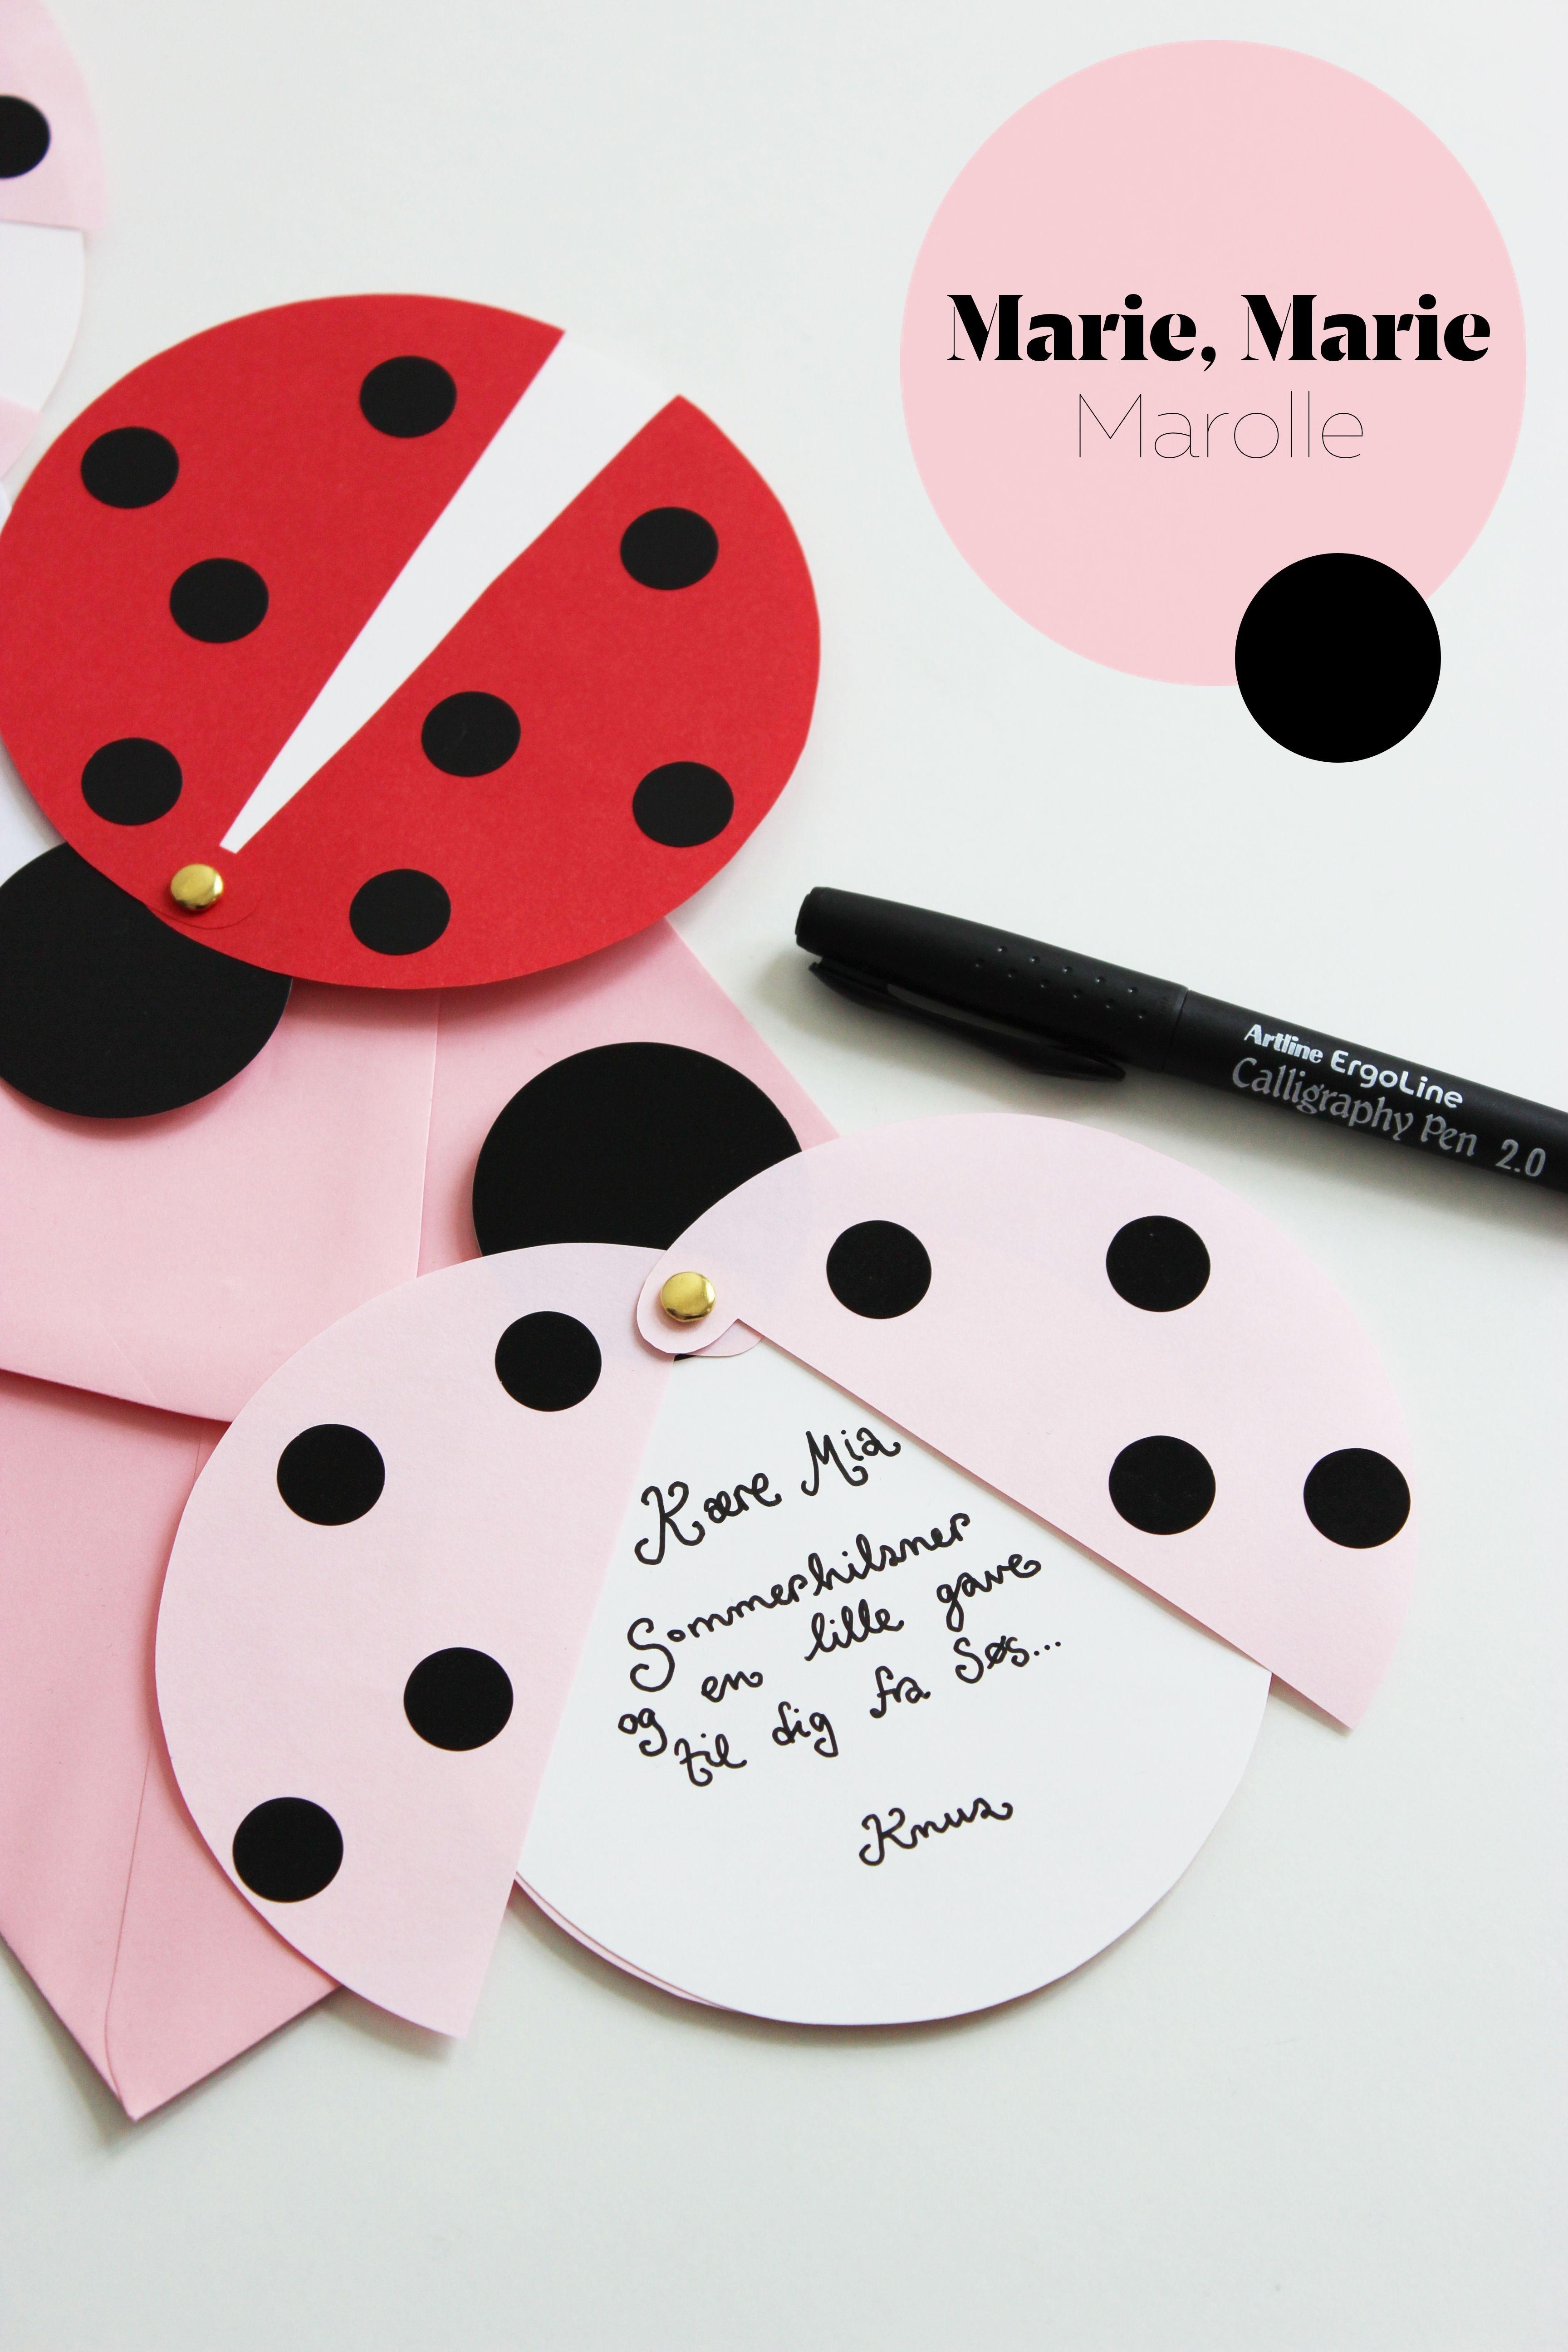 Diy: Ladybug Party Invitations (Free Printable Template) | Father En - Free Printable Ladybug Invitations